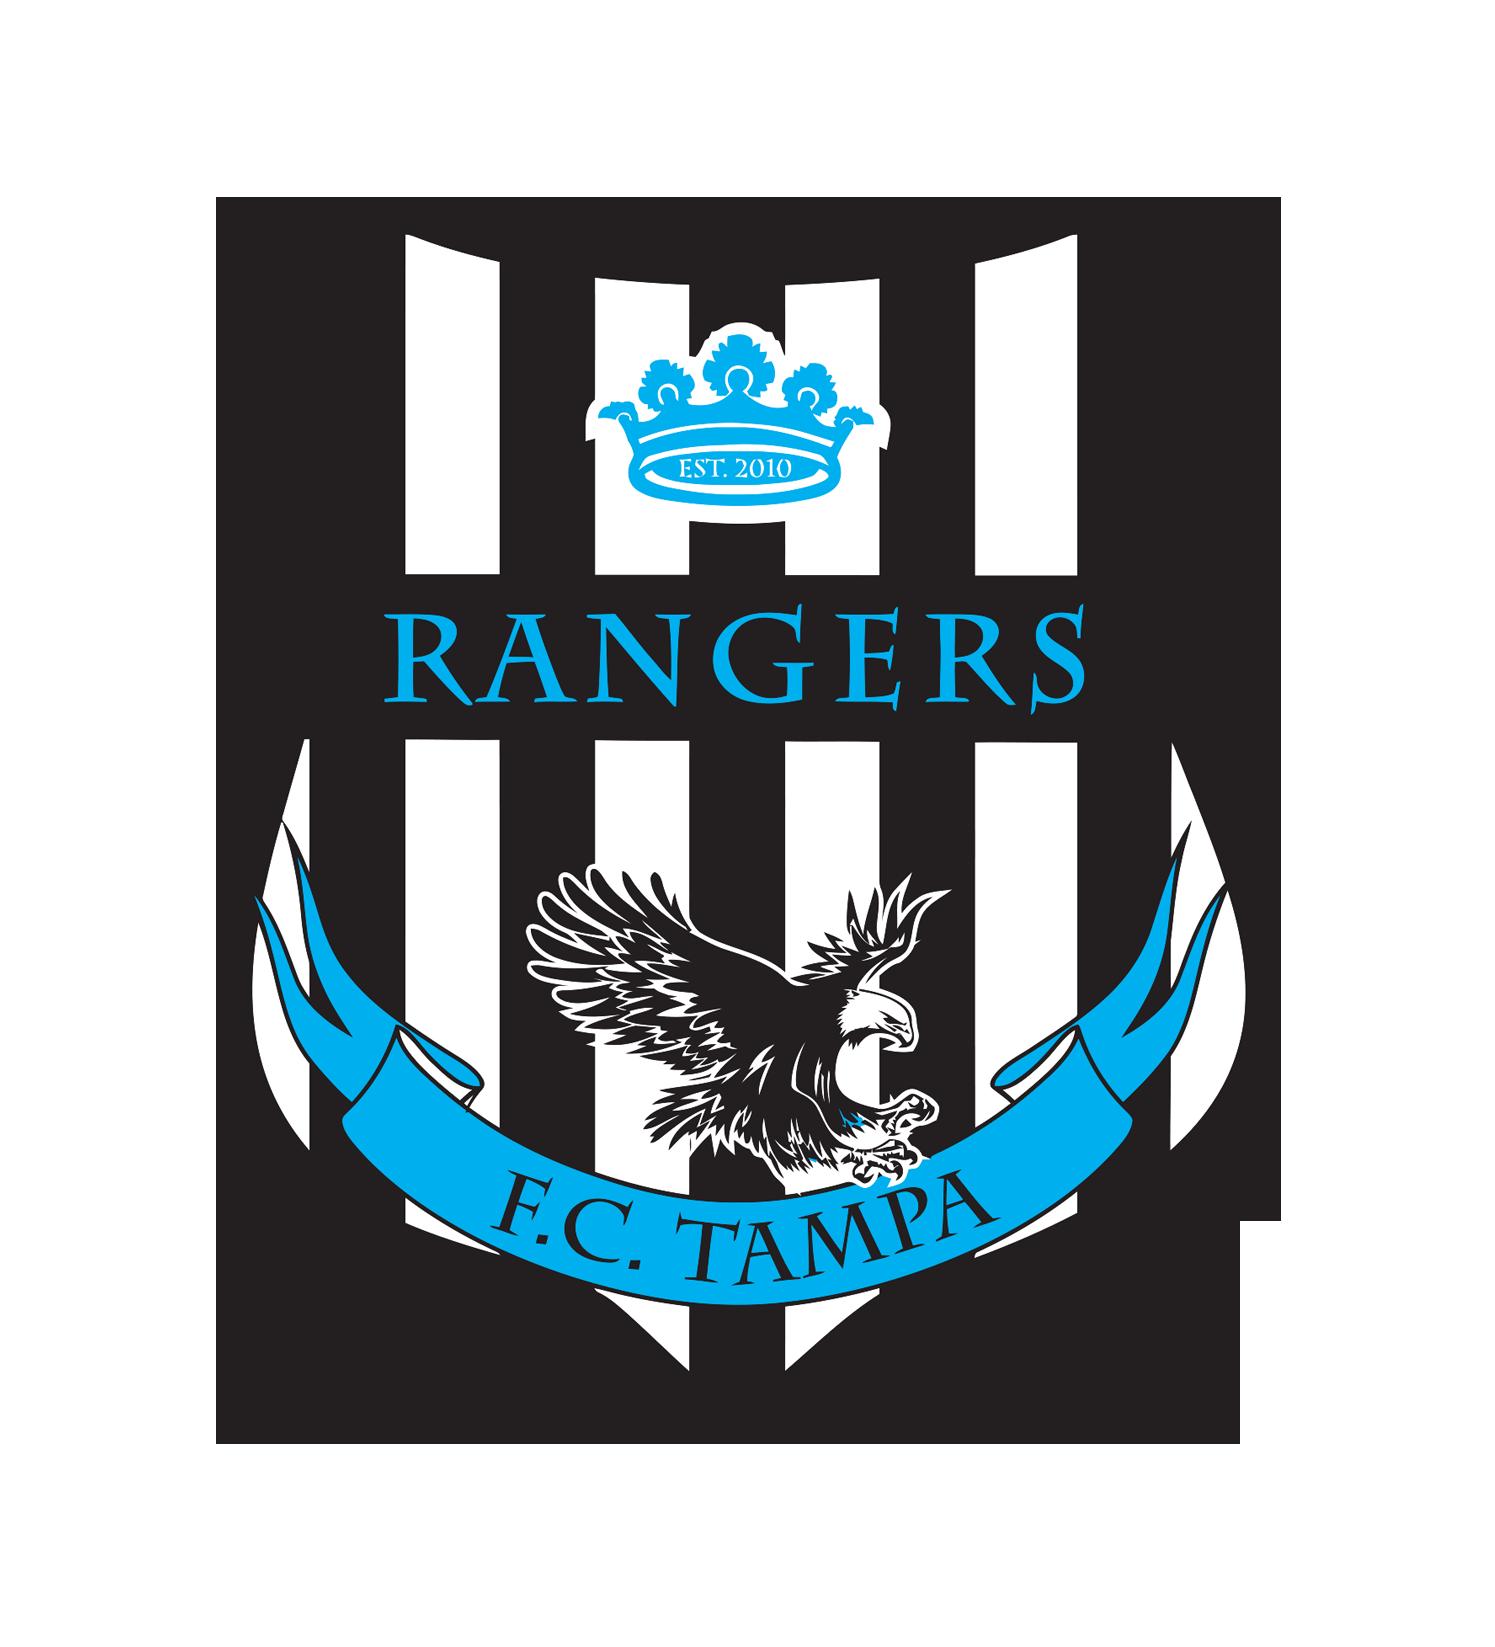 2019 FC Tampa Rangers Annual Golf Tournament logo